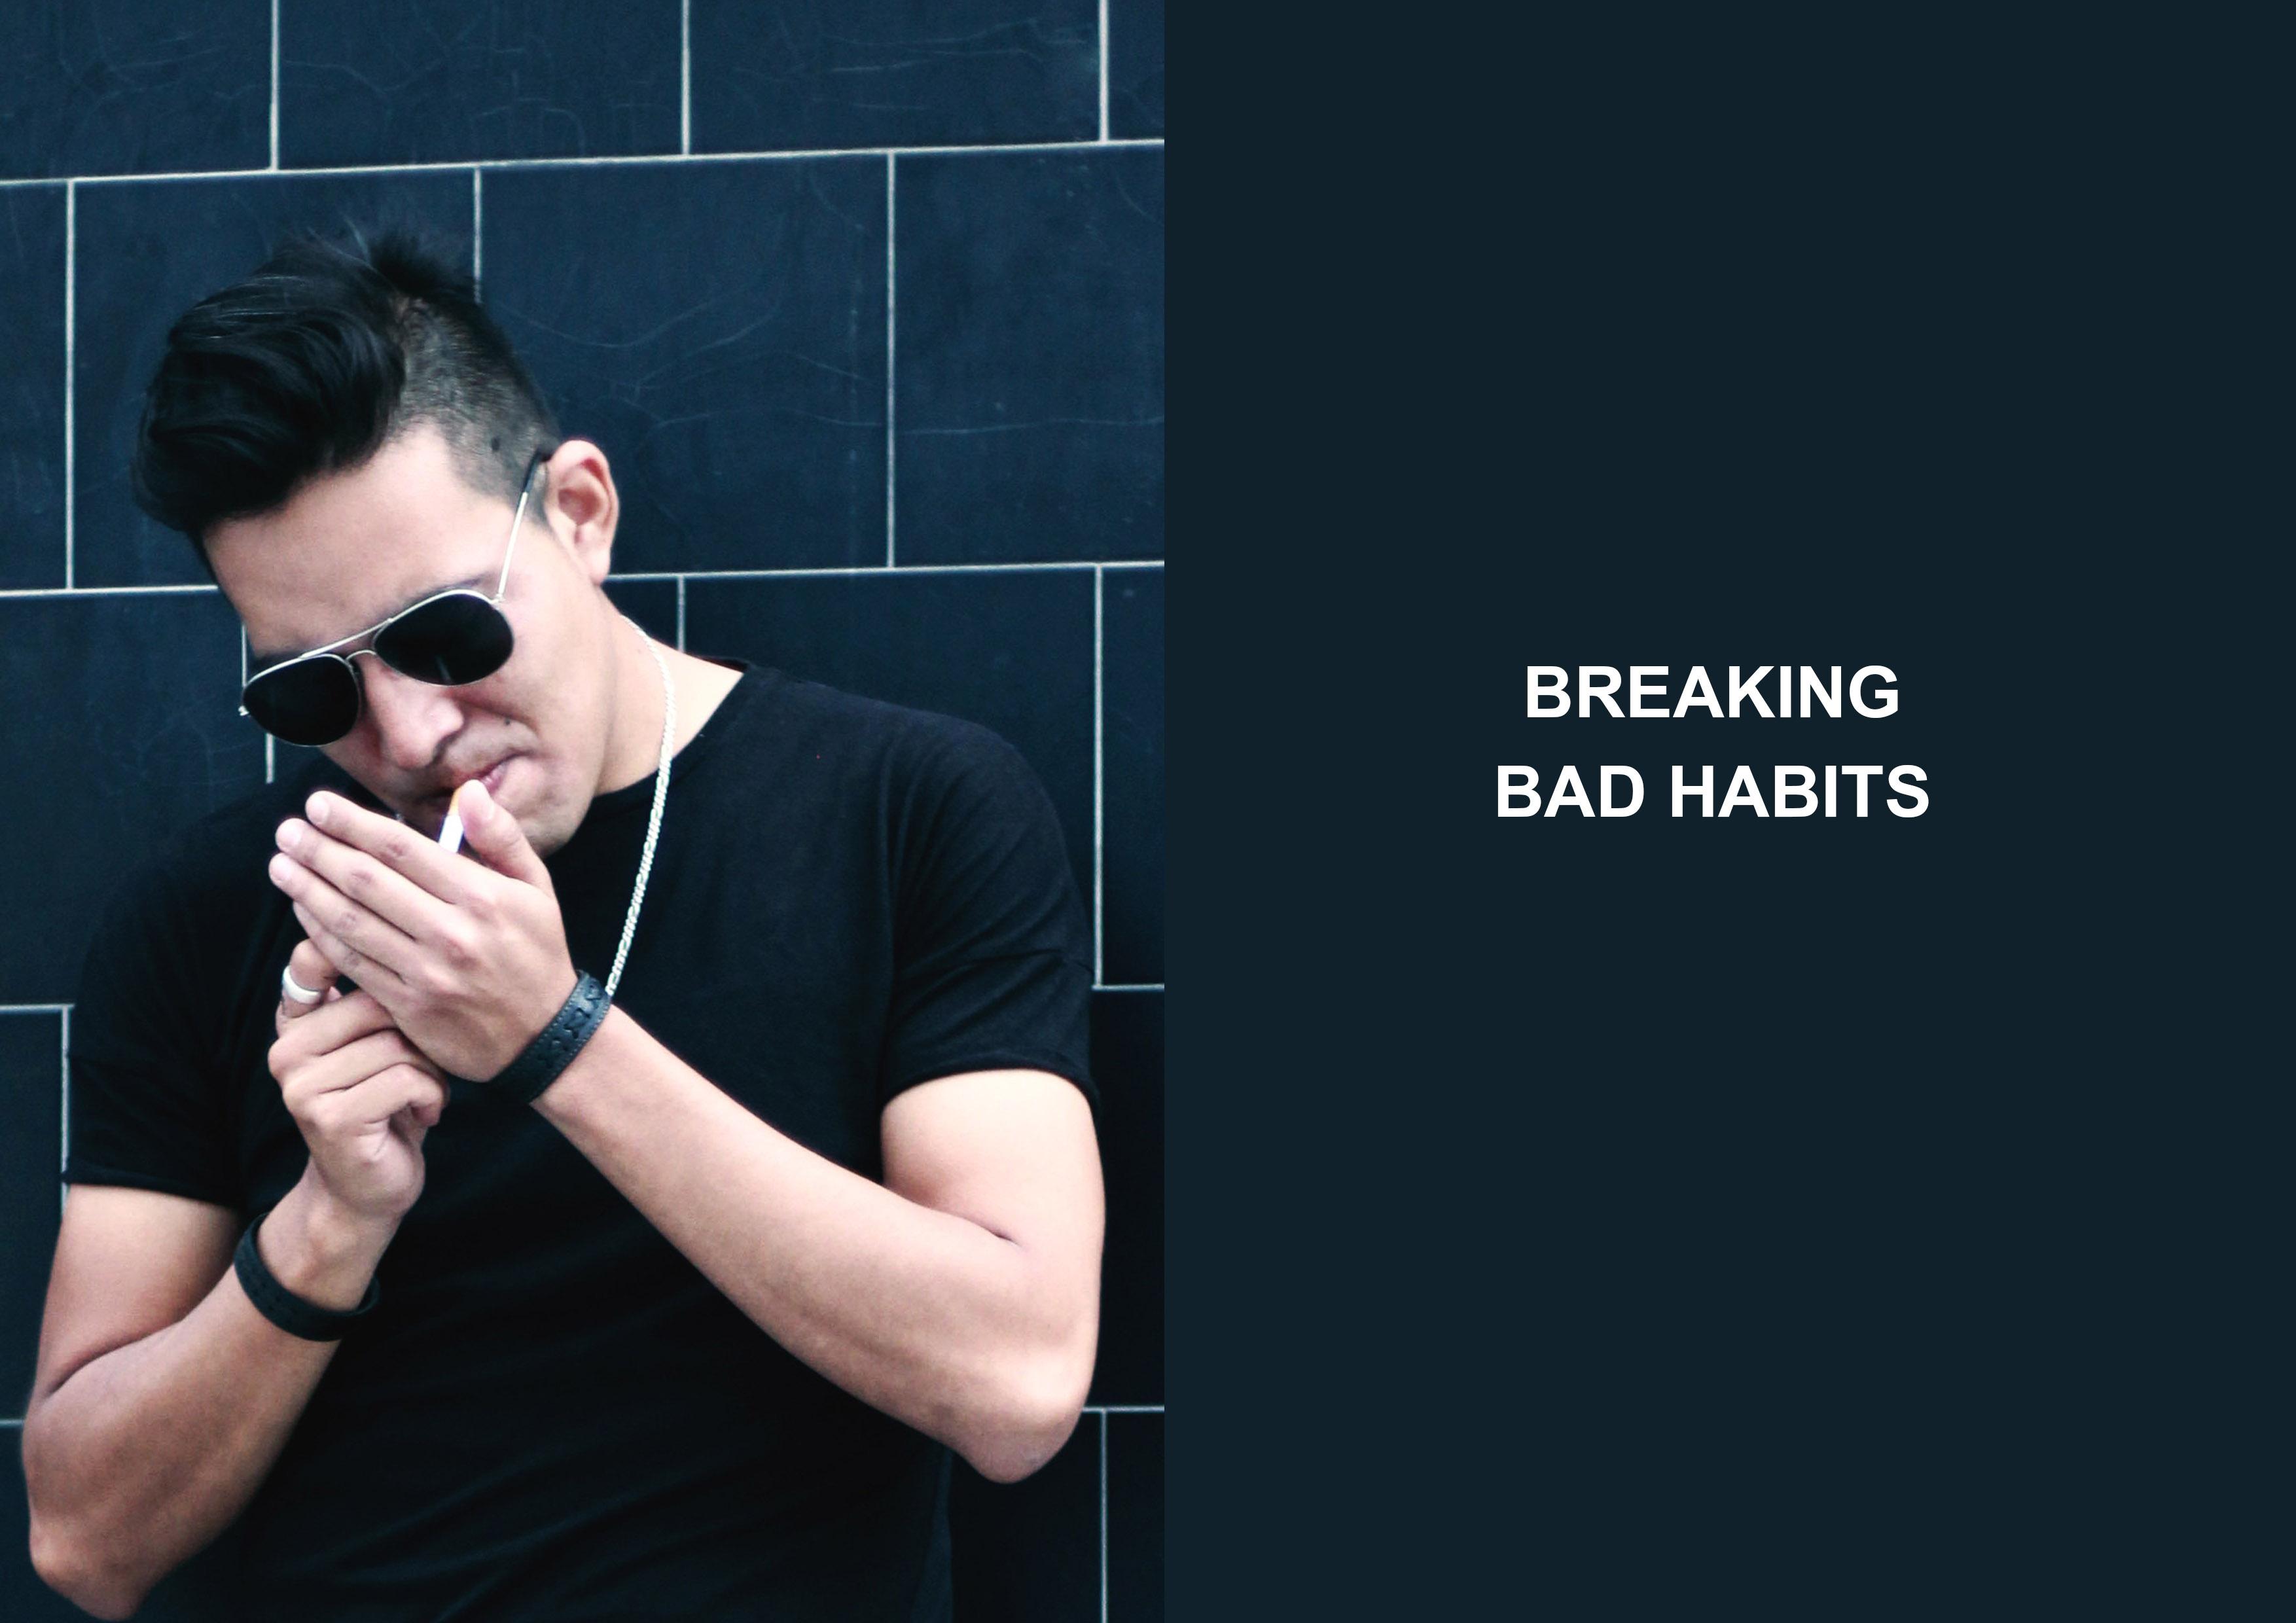 1 hour to Breaking Bad Habits